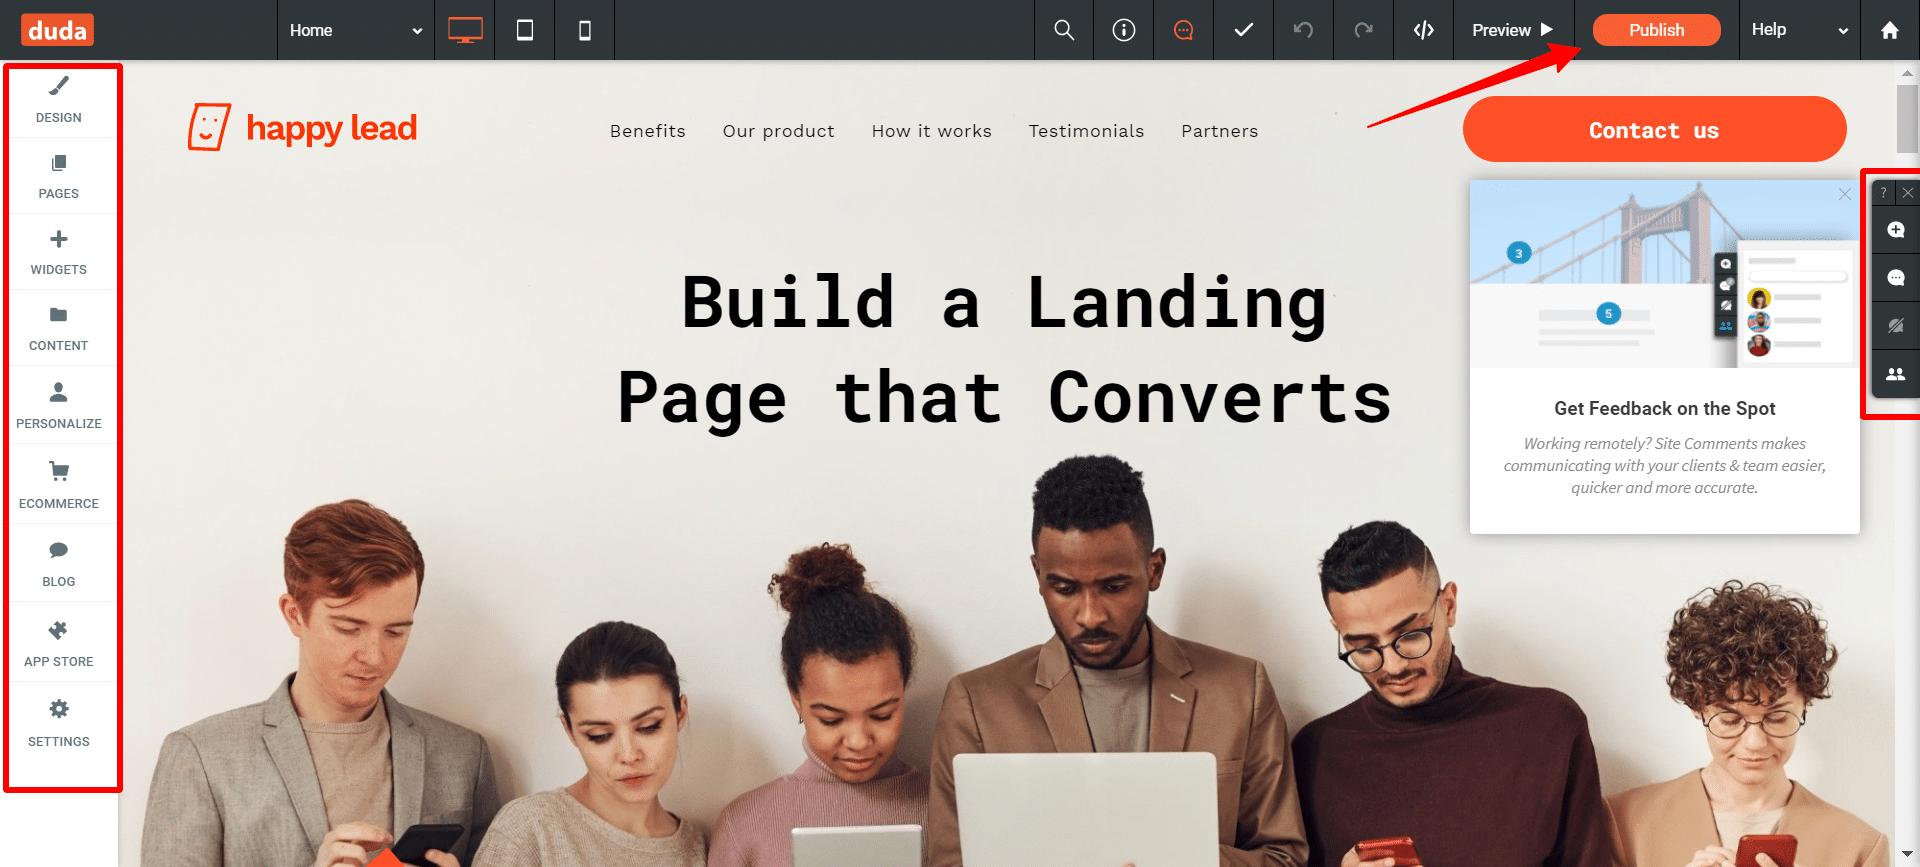 Duda-Site-Editor-drag-and-drop